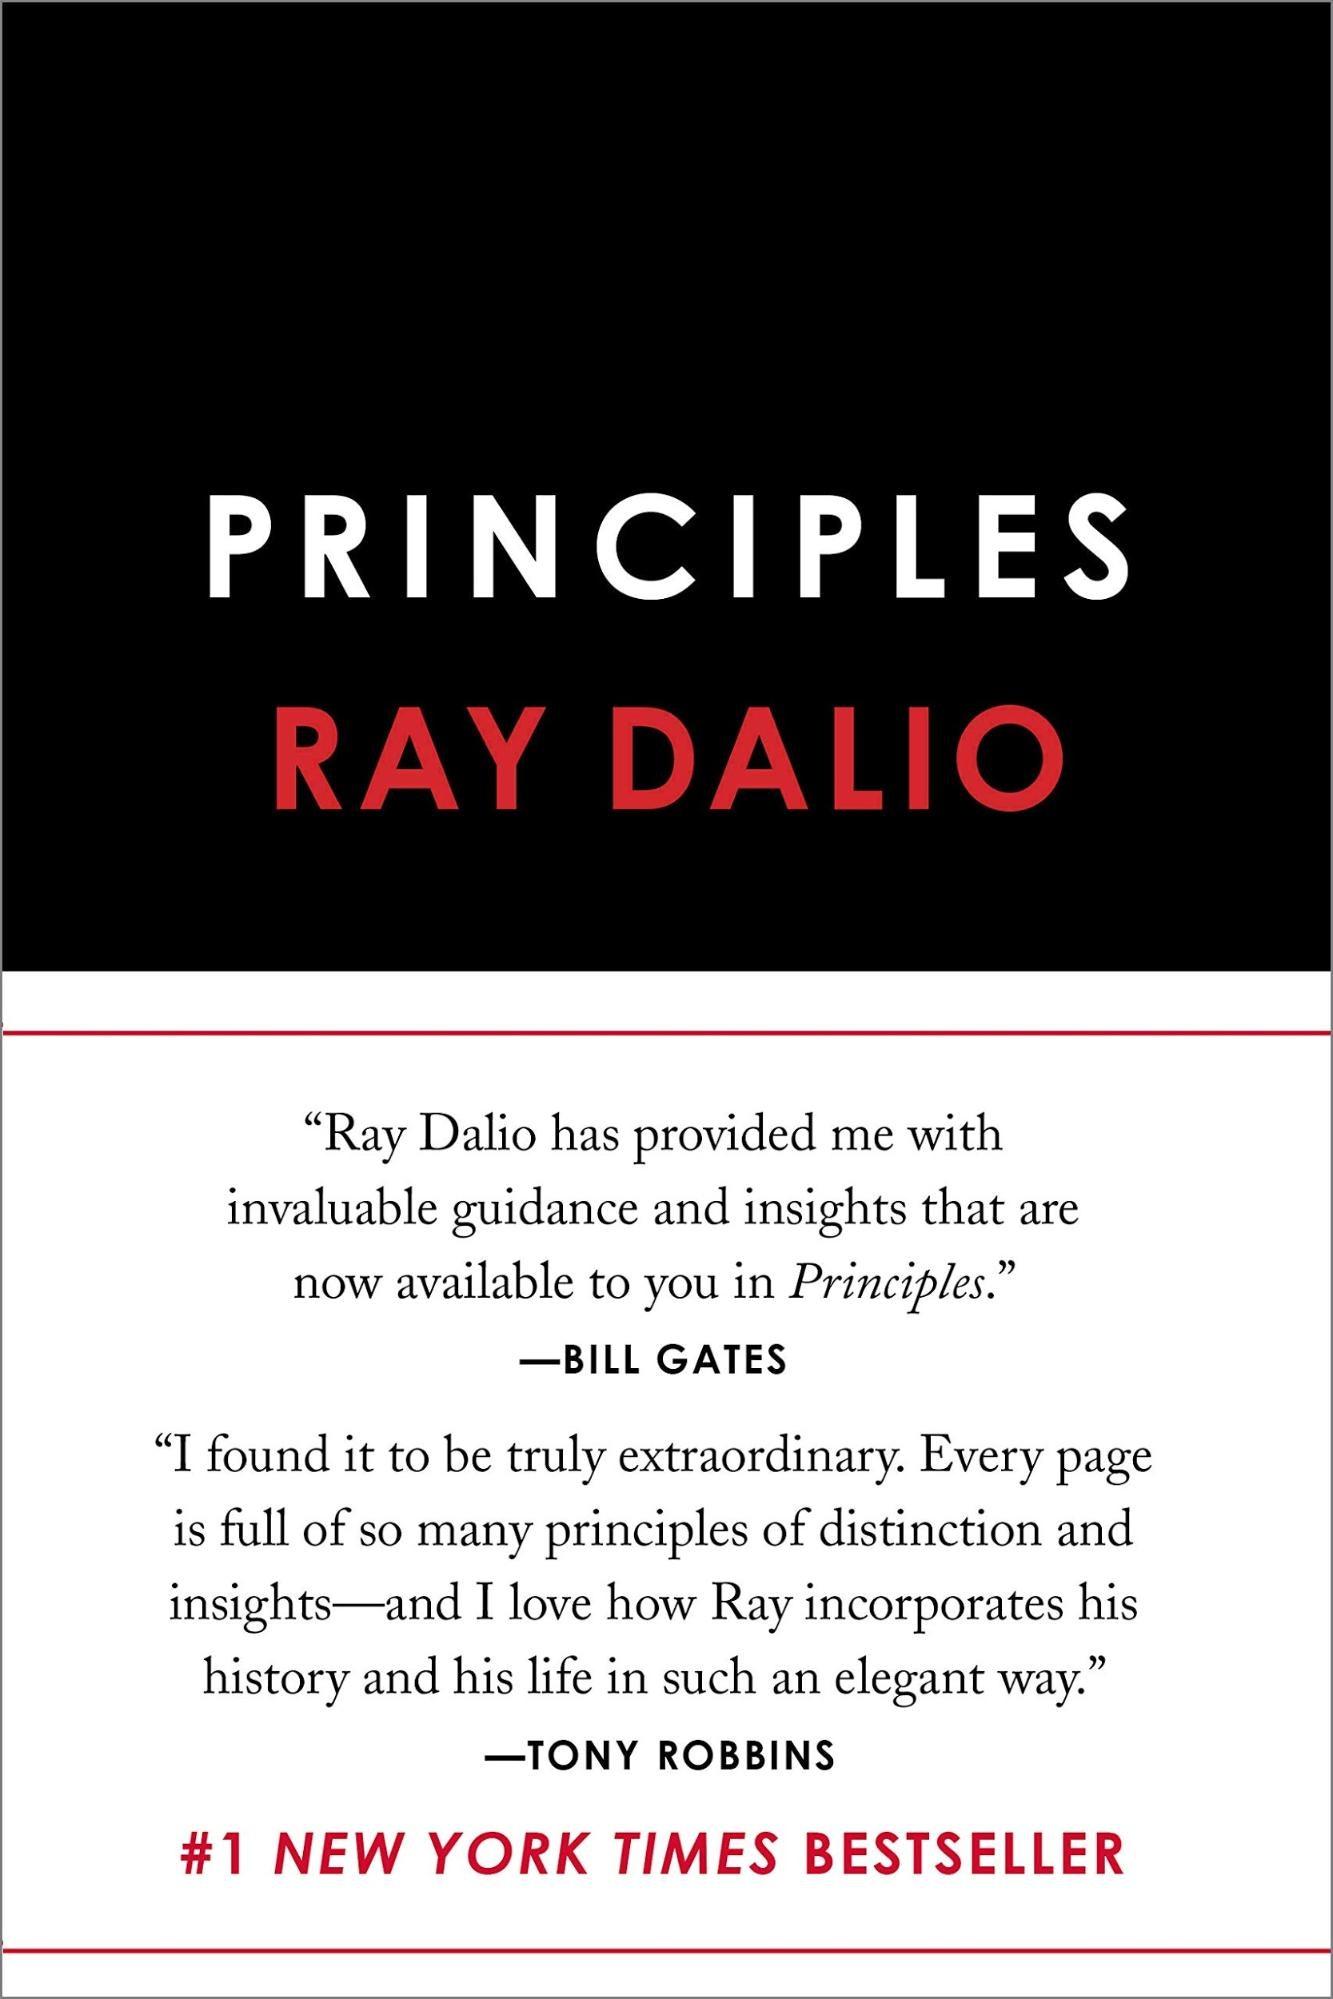 Principles – Ray Dalio